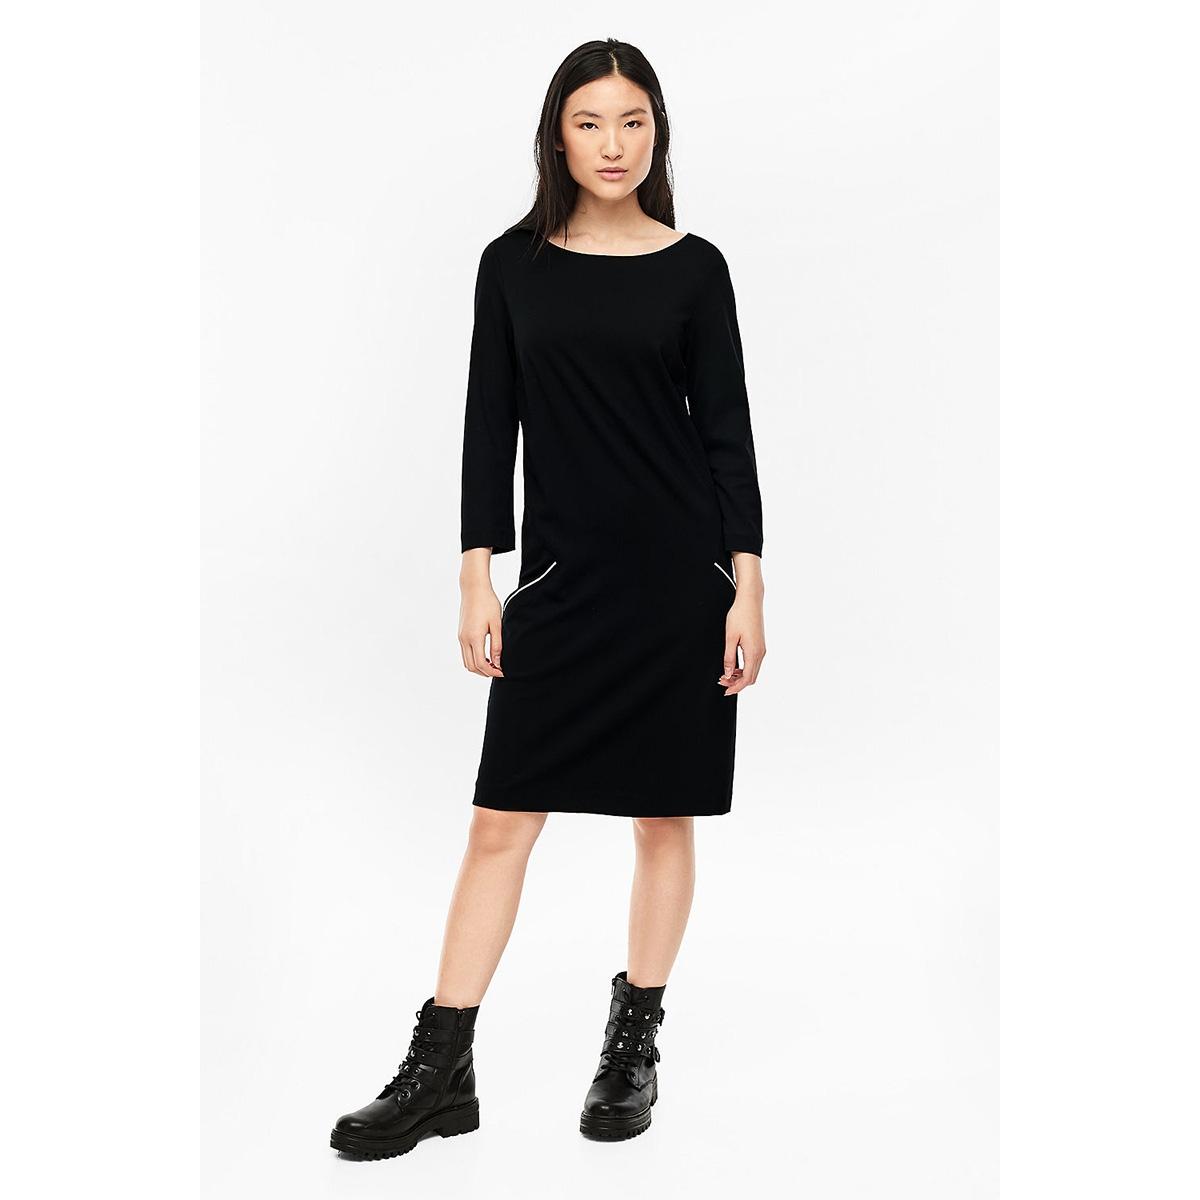 jurk met steekzakken 14911825270 s.oliver jurk 9999